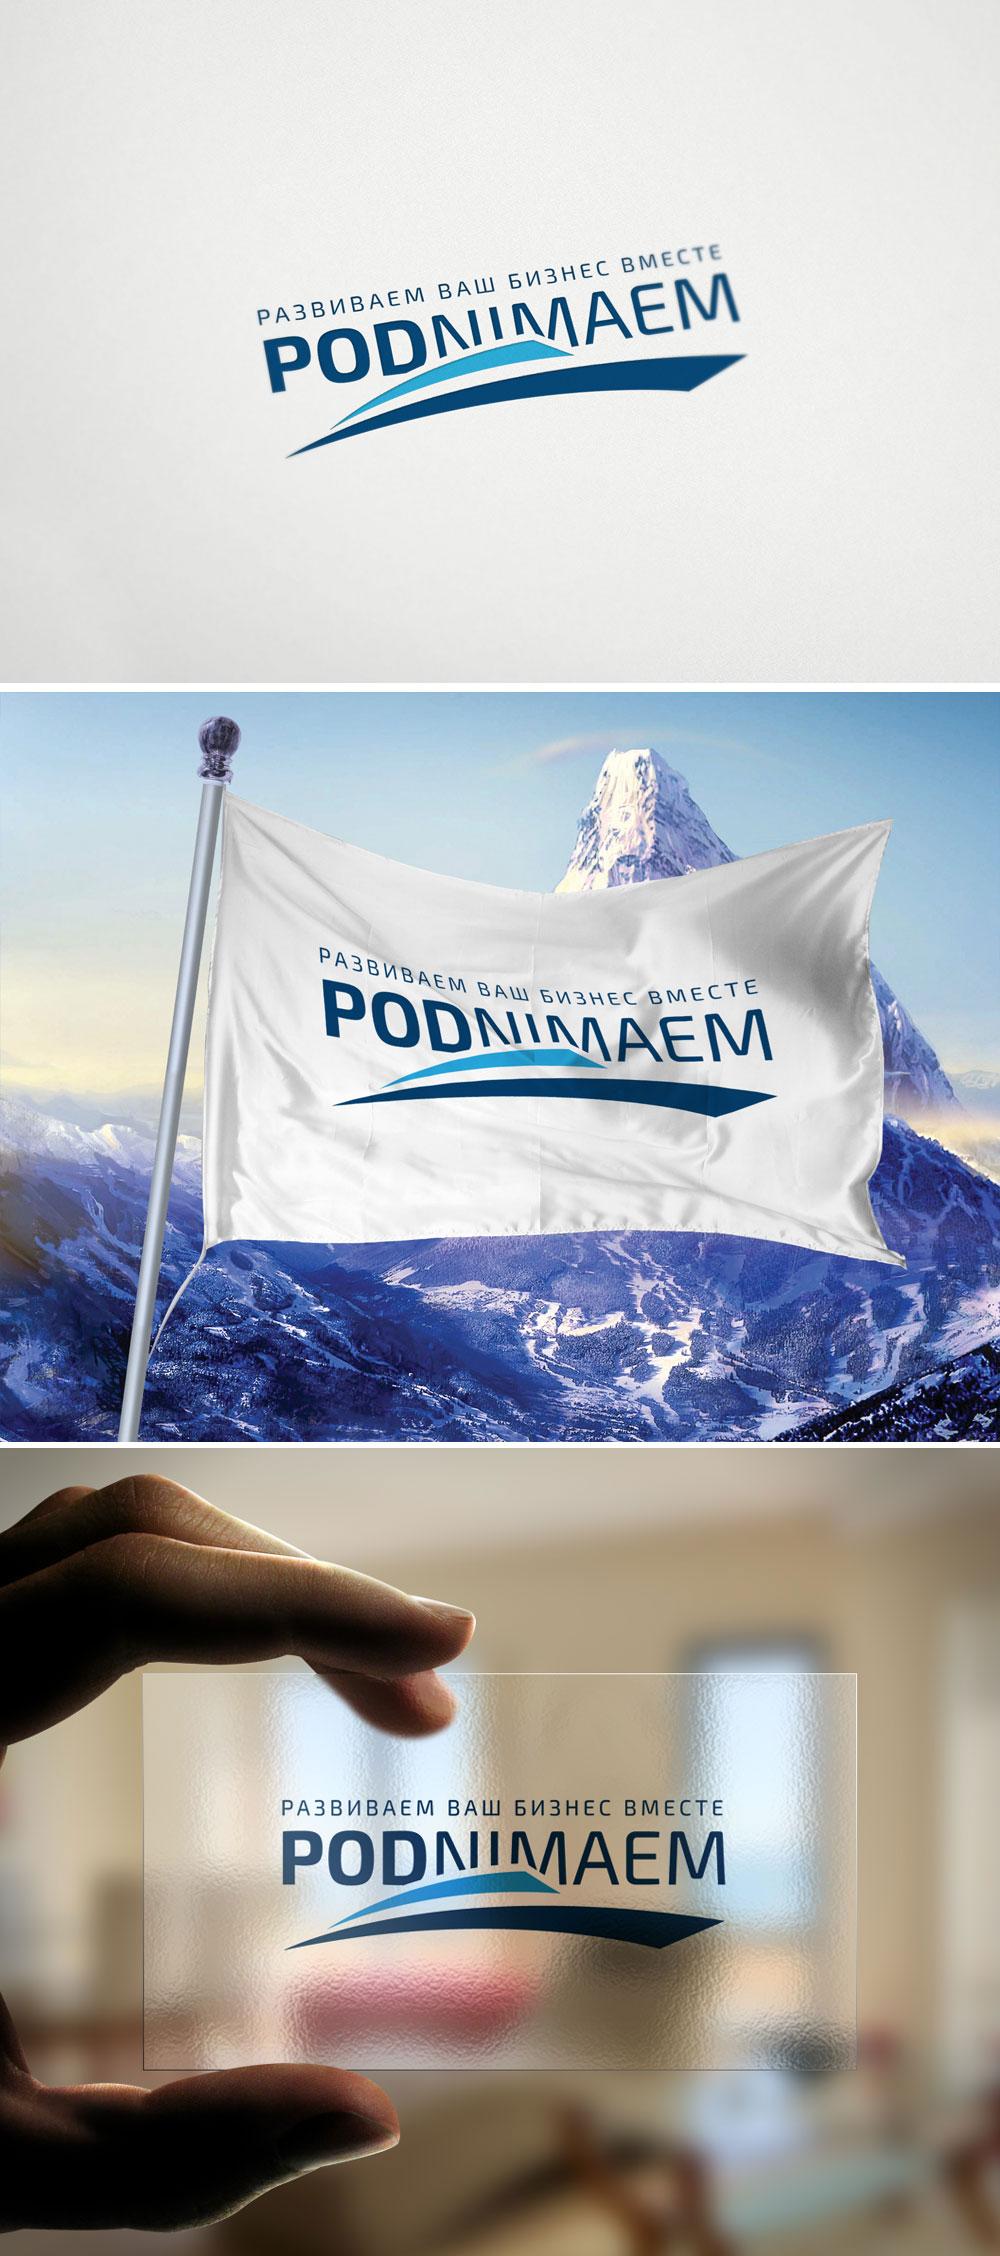 Разработать логотип + визитку + логотип для печати ООО +++ фото f_525554c8af4f0cc8.jpg